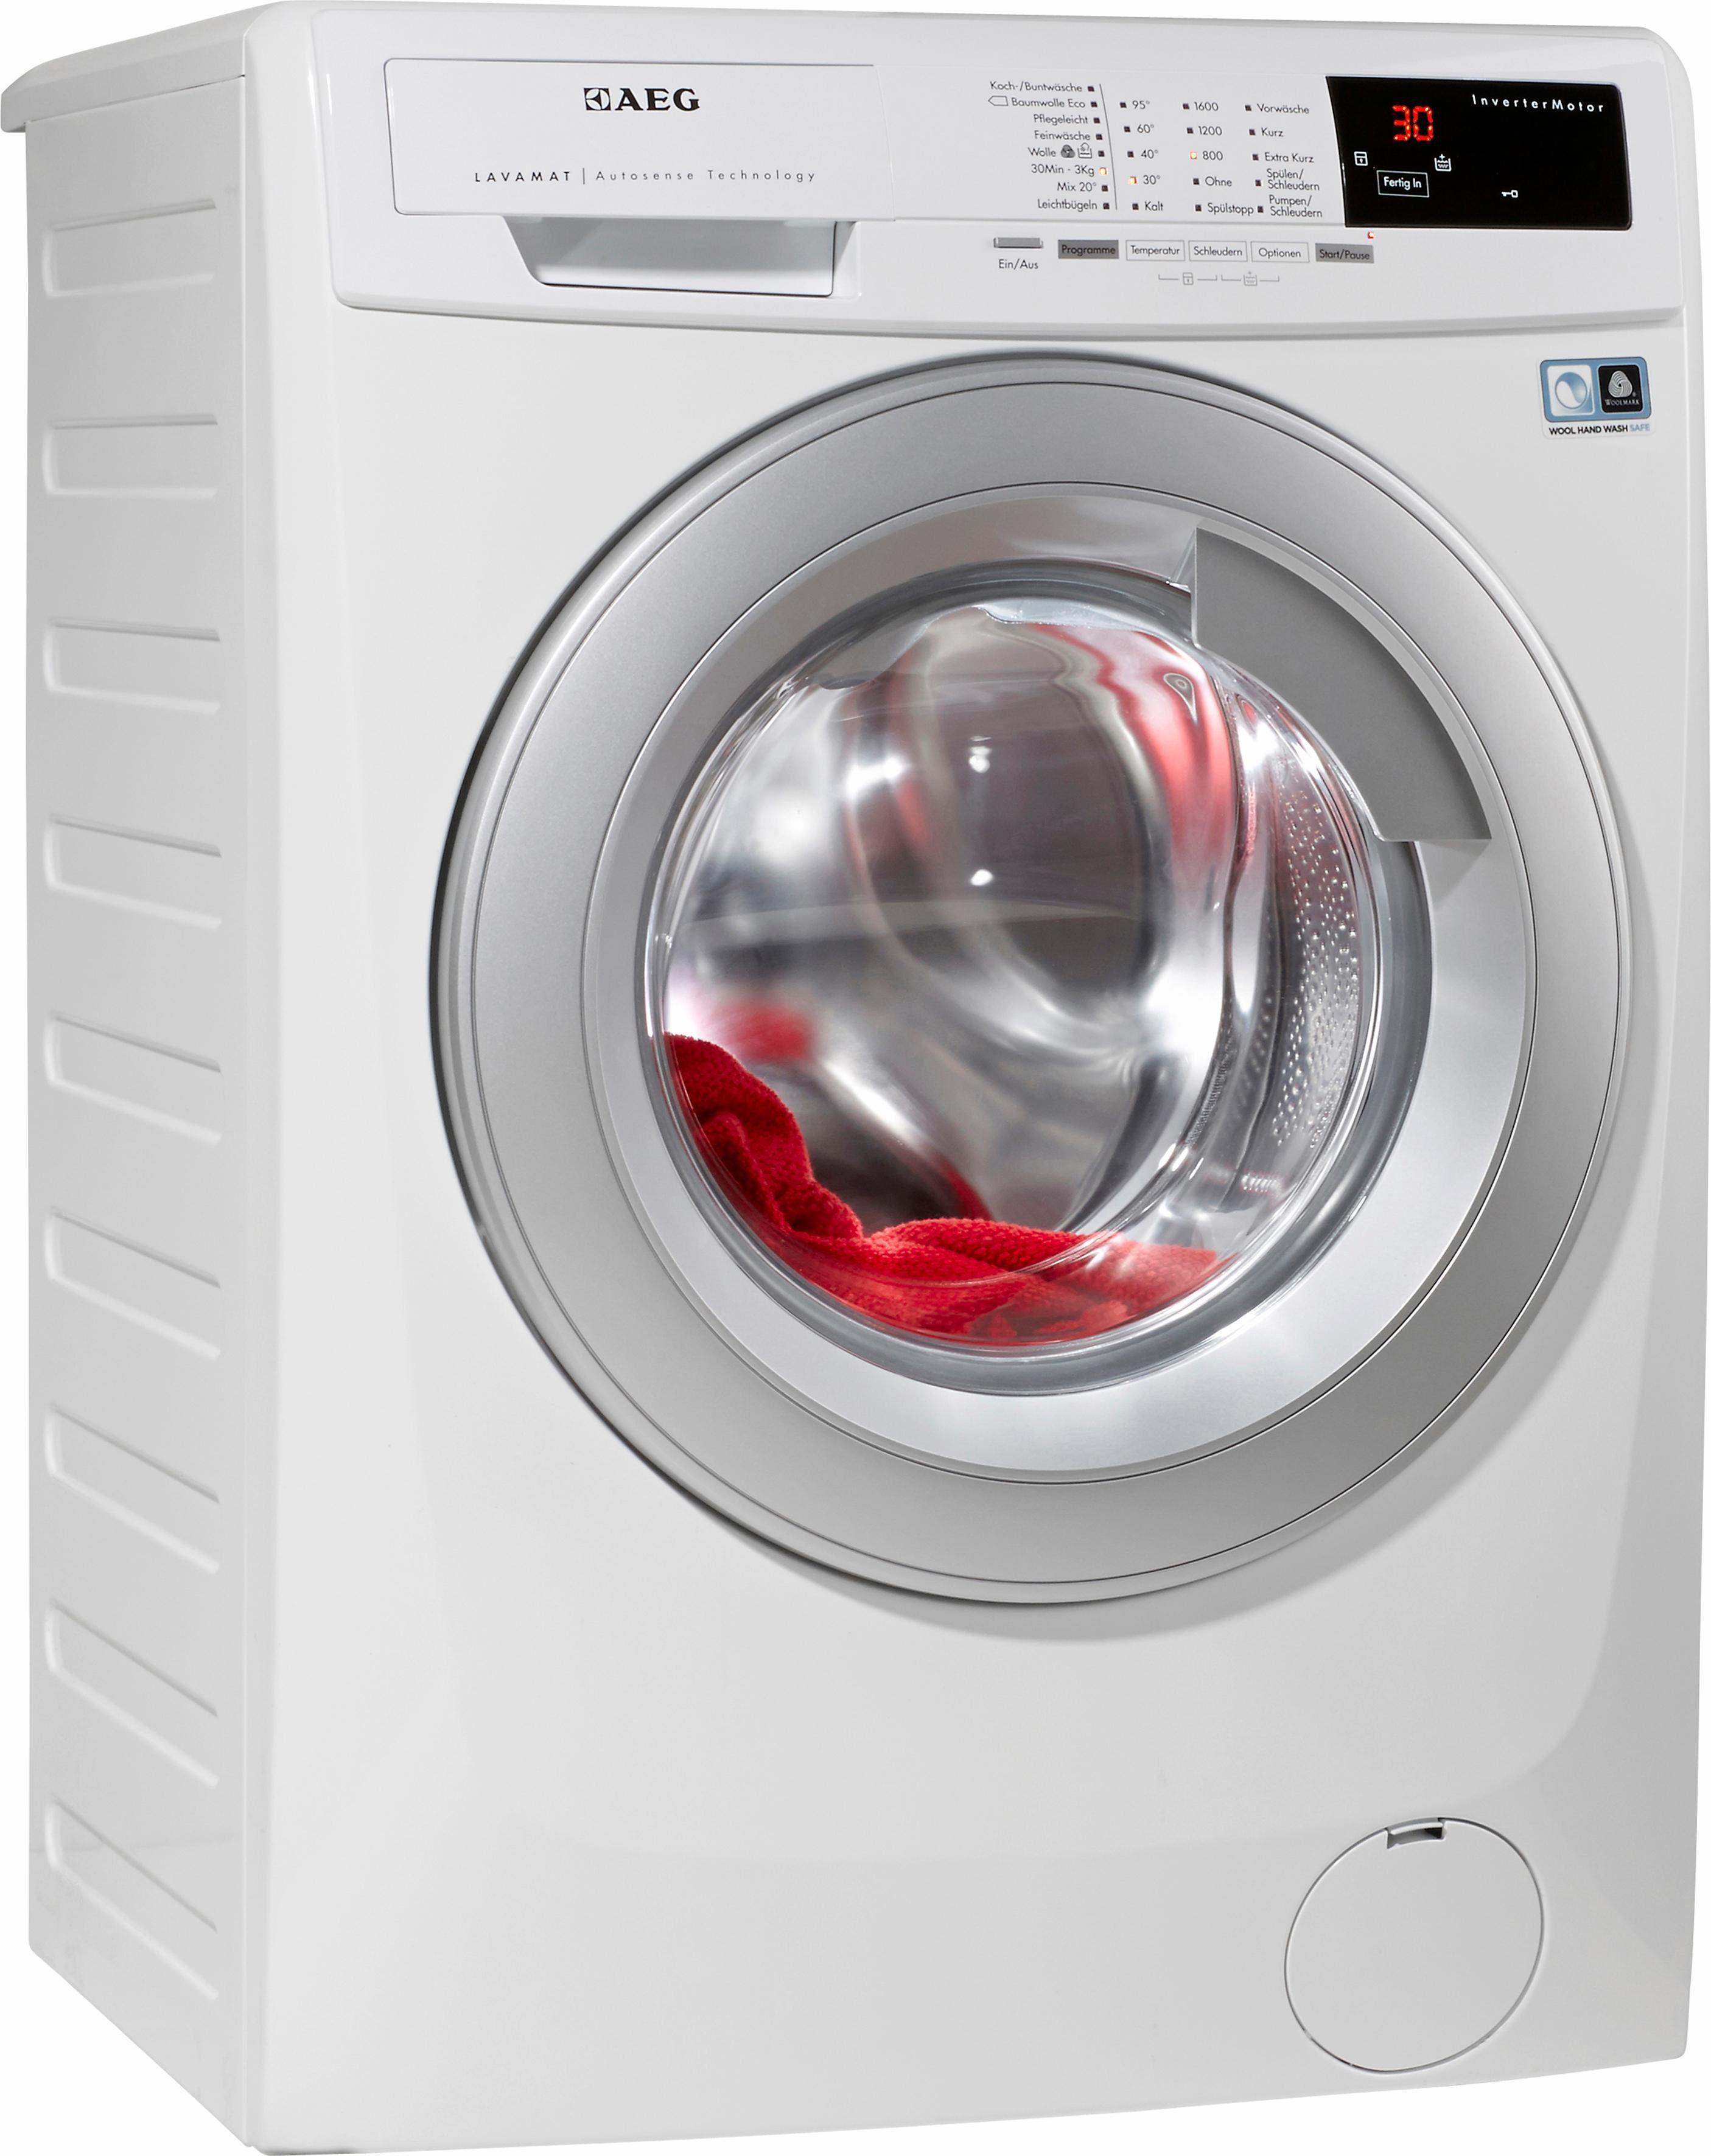 AEG Waschmaschine LAVAMAT L14AS9, A+++, 9 kg, 1400 U/Min